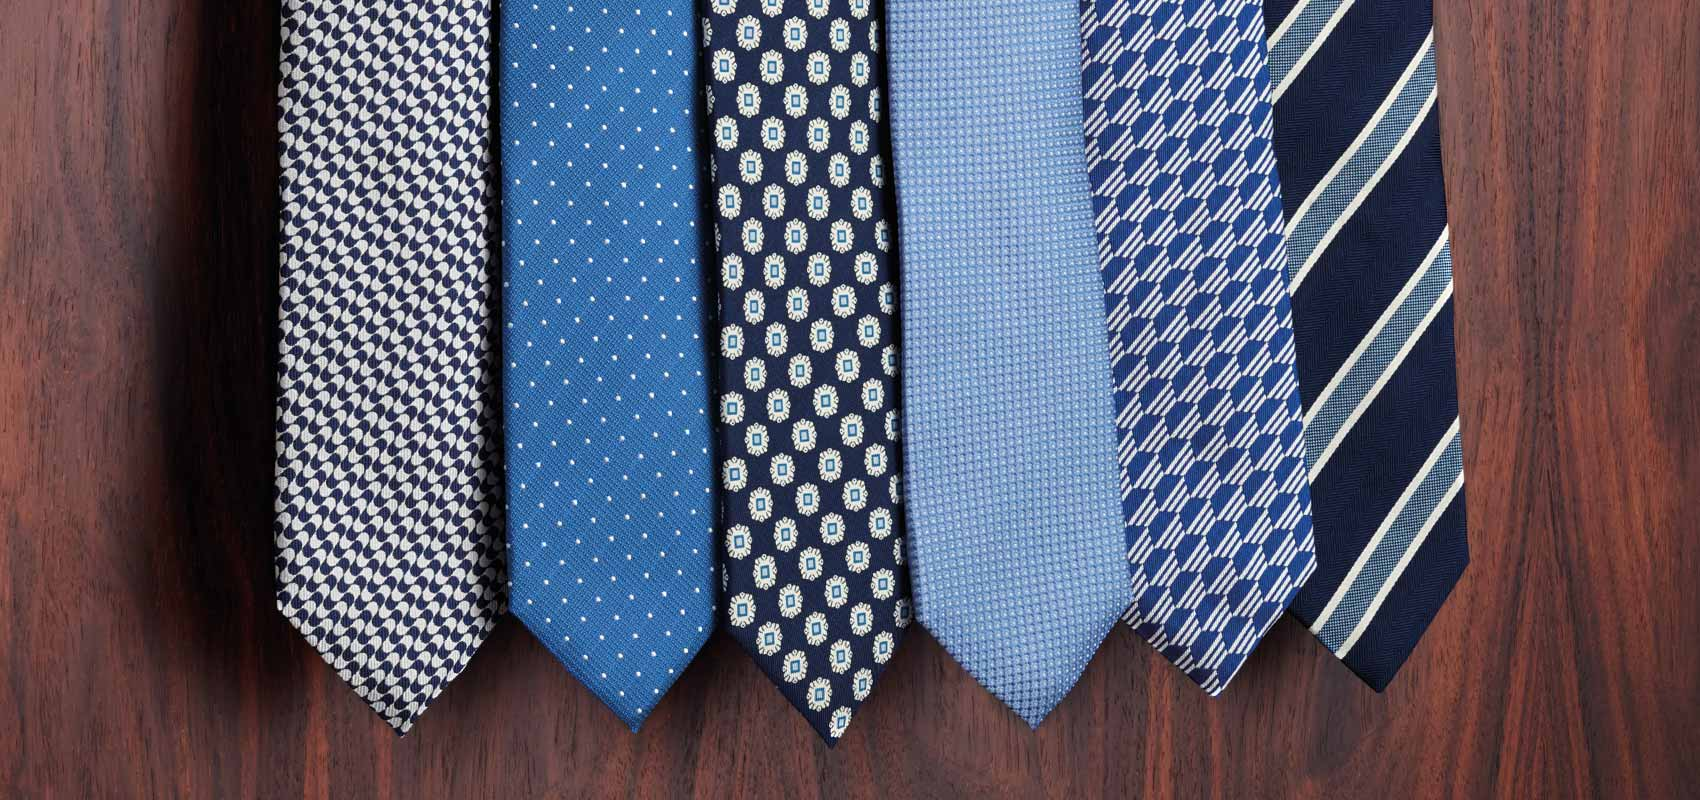 Charles Tyrwhitt Cravates classiques